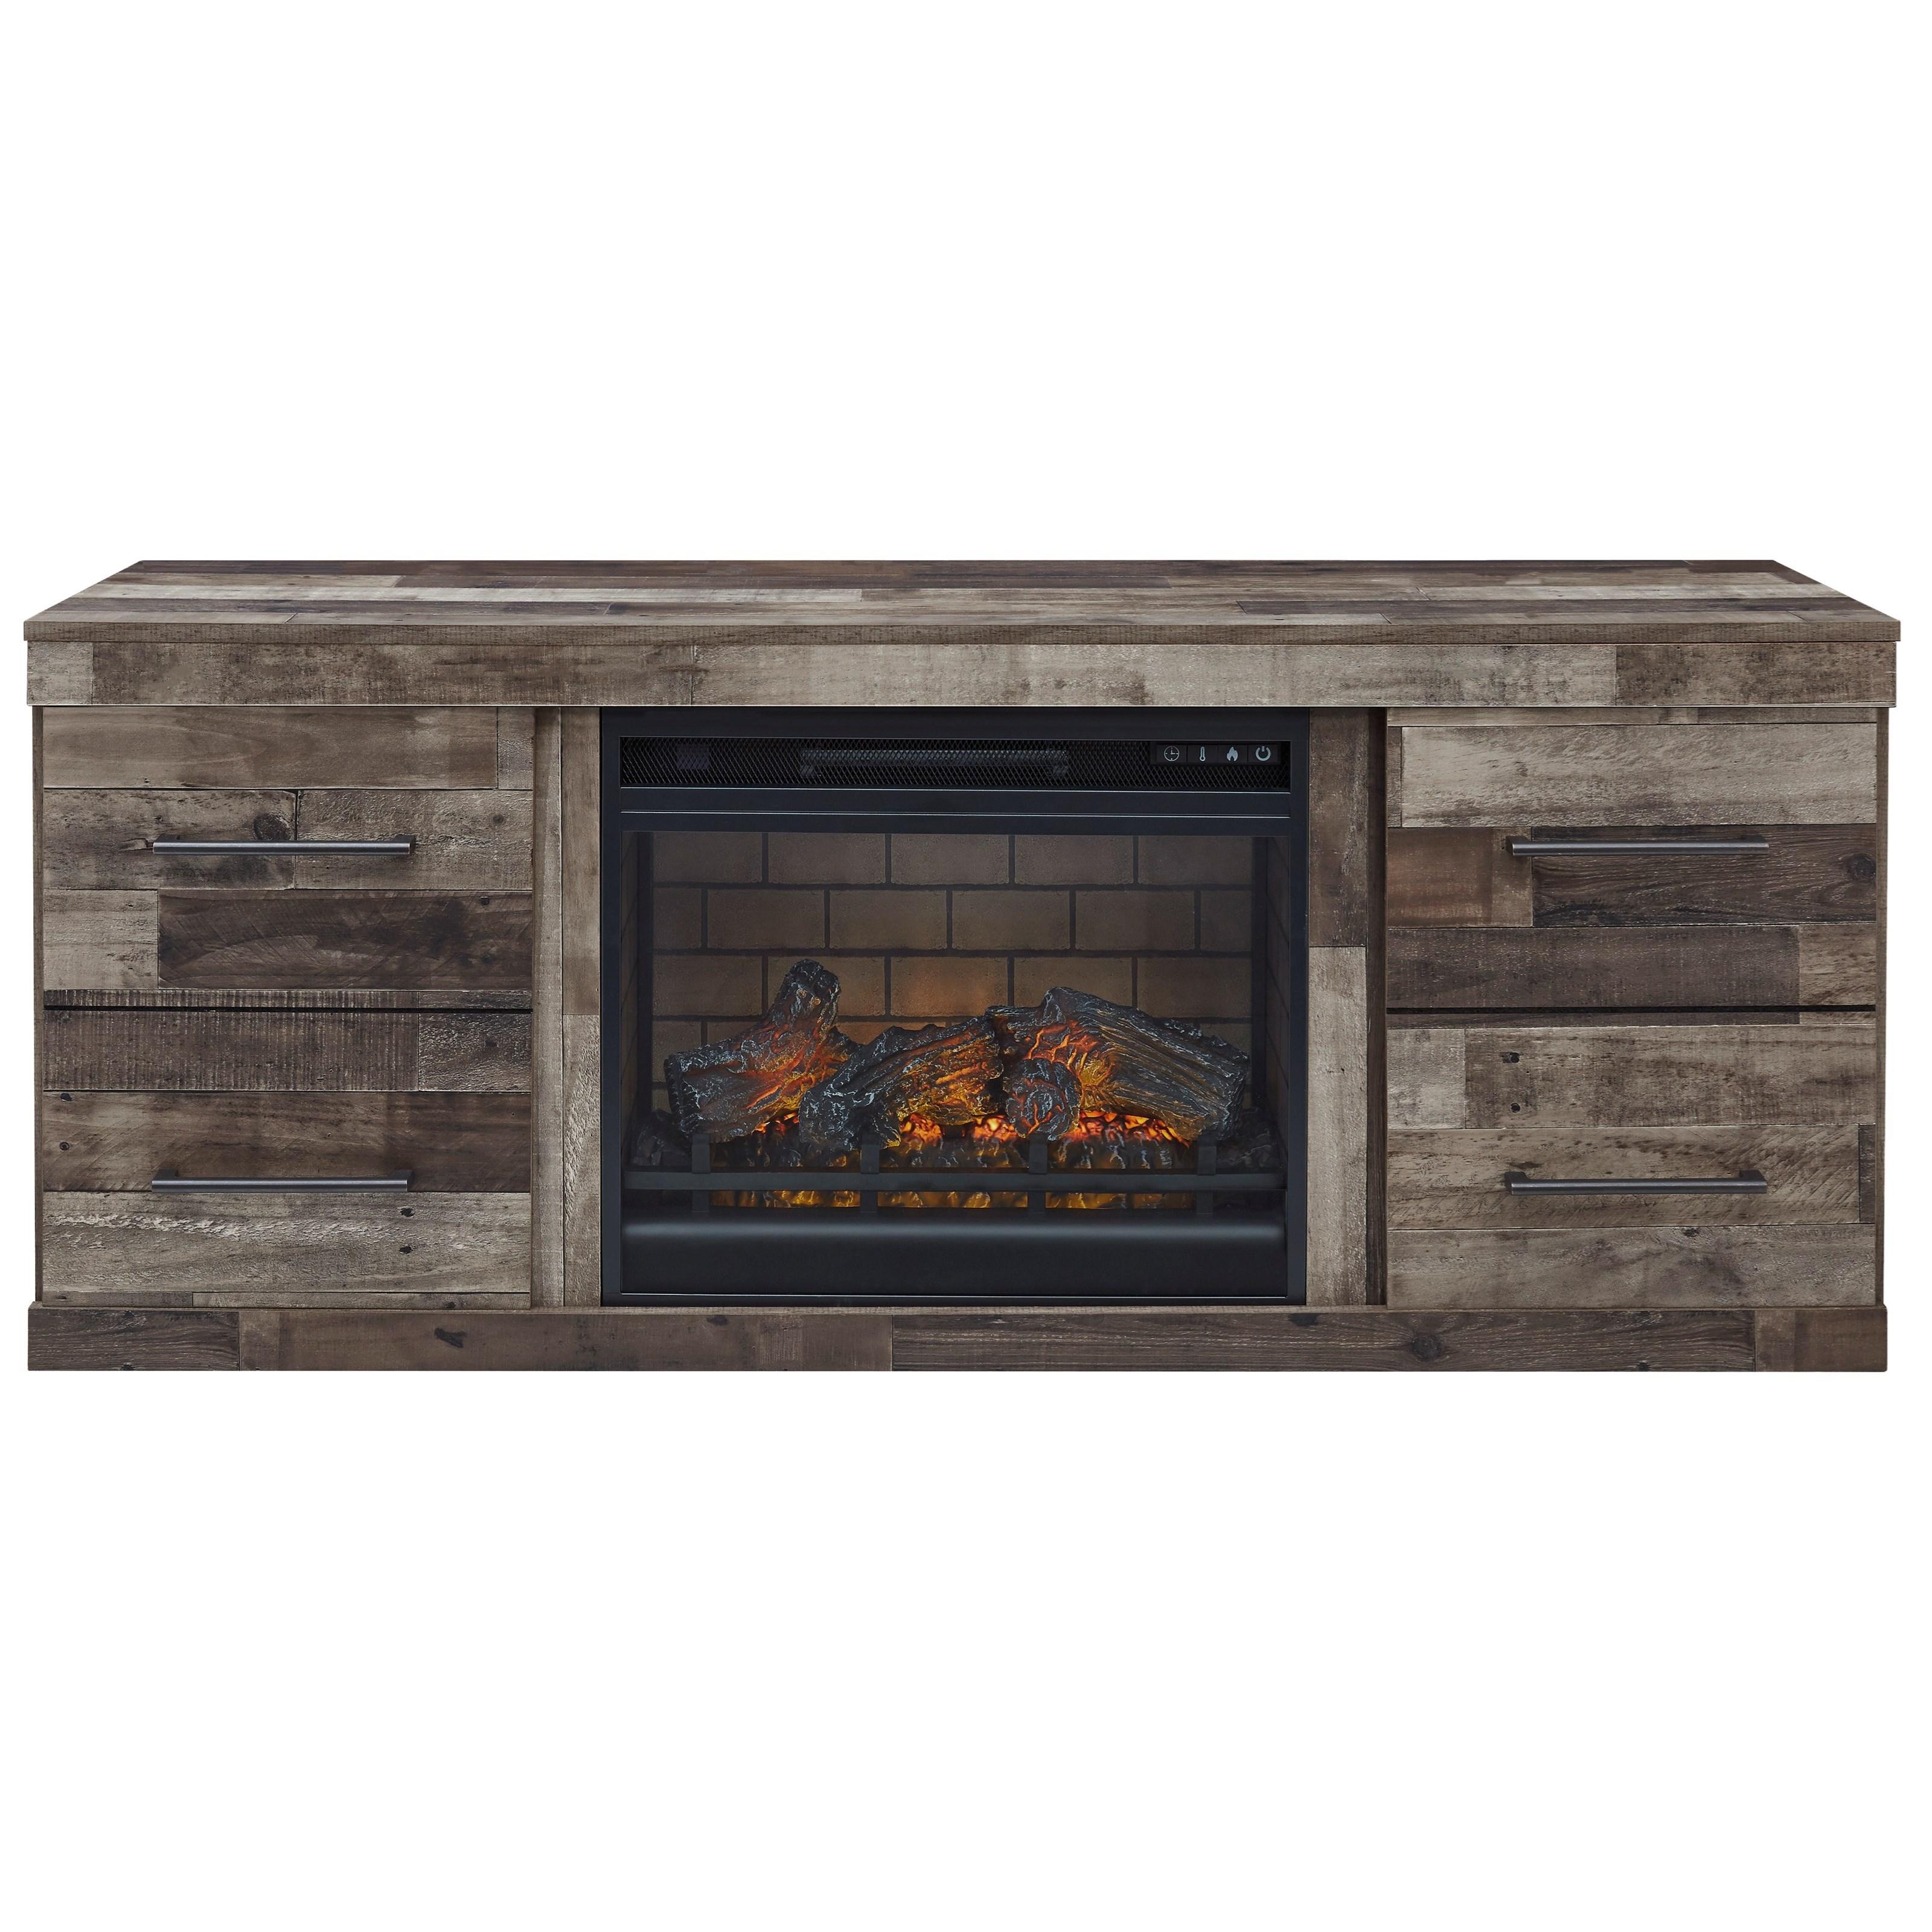 Rustic 2-Door Fireplace Console